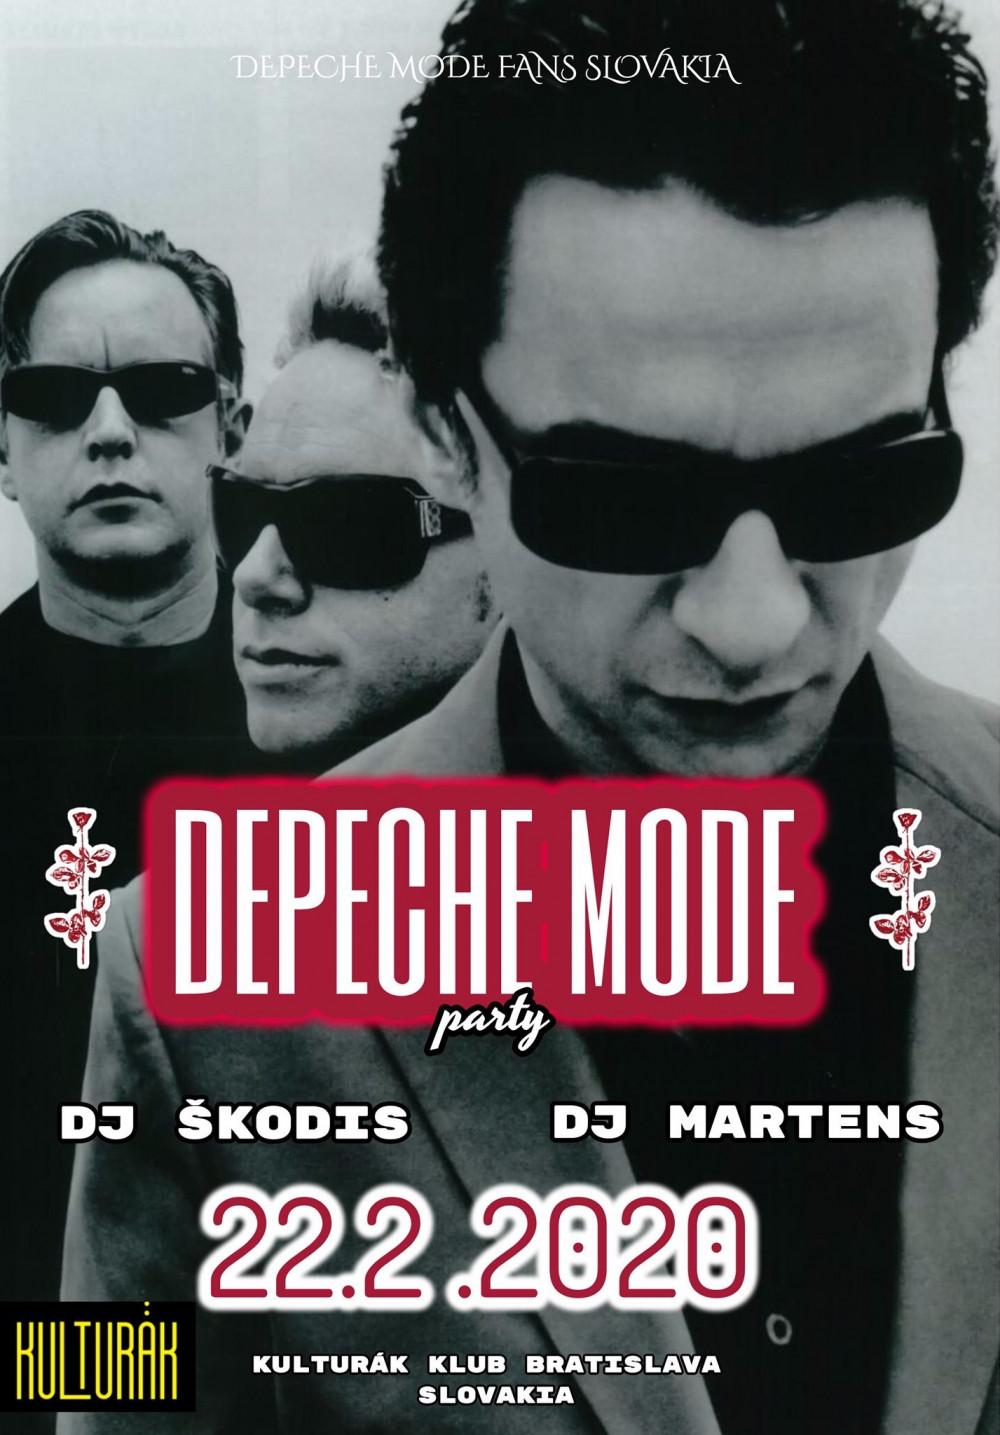 Bratislava: Depeche MODE party